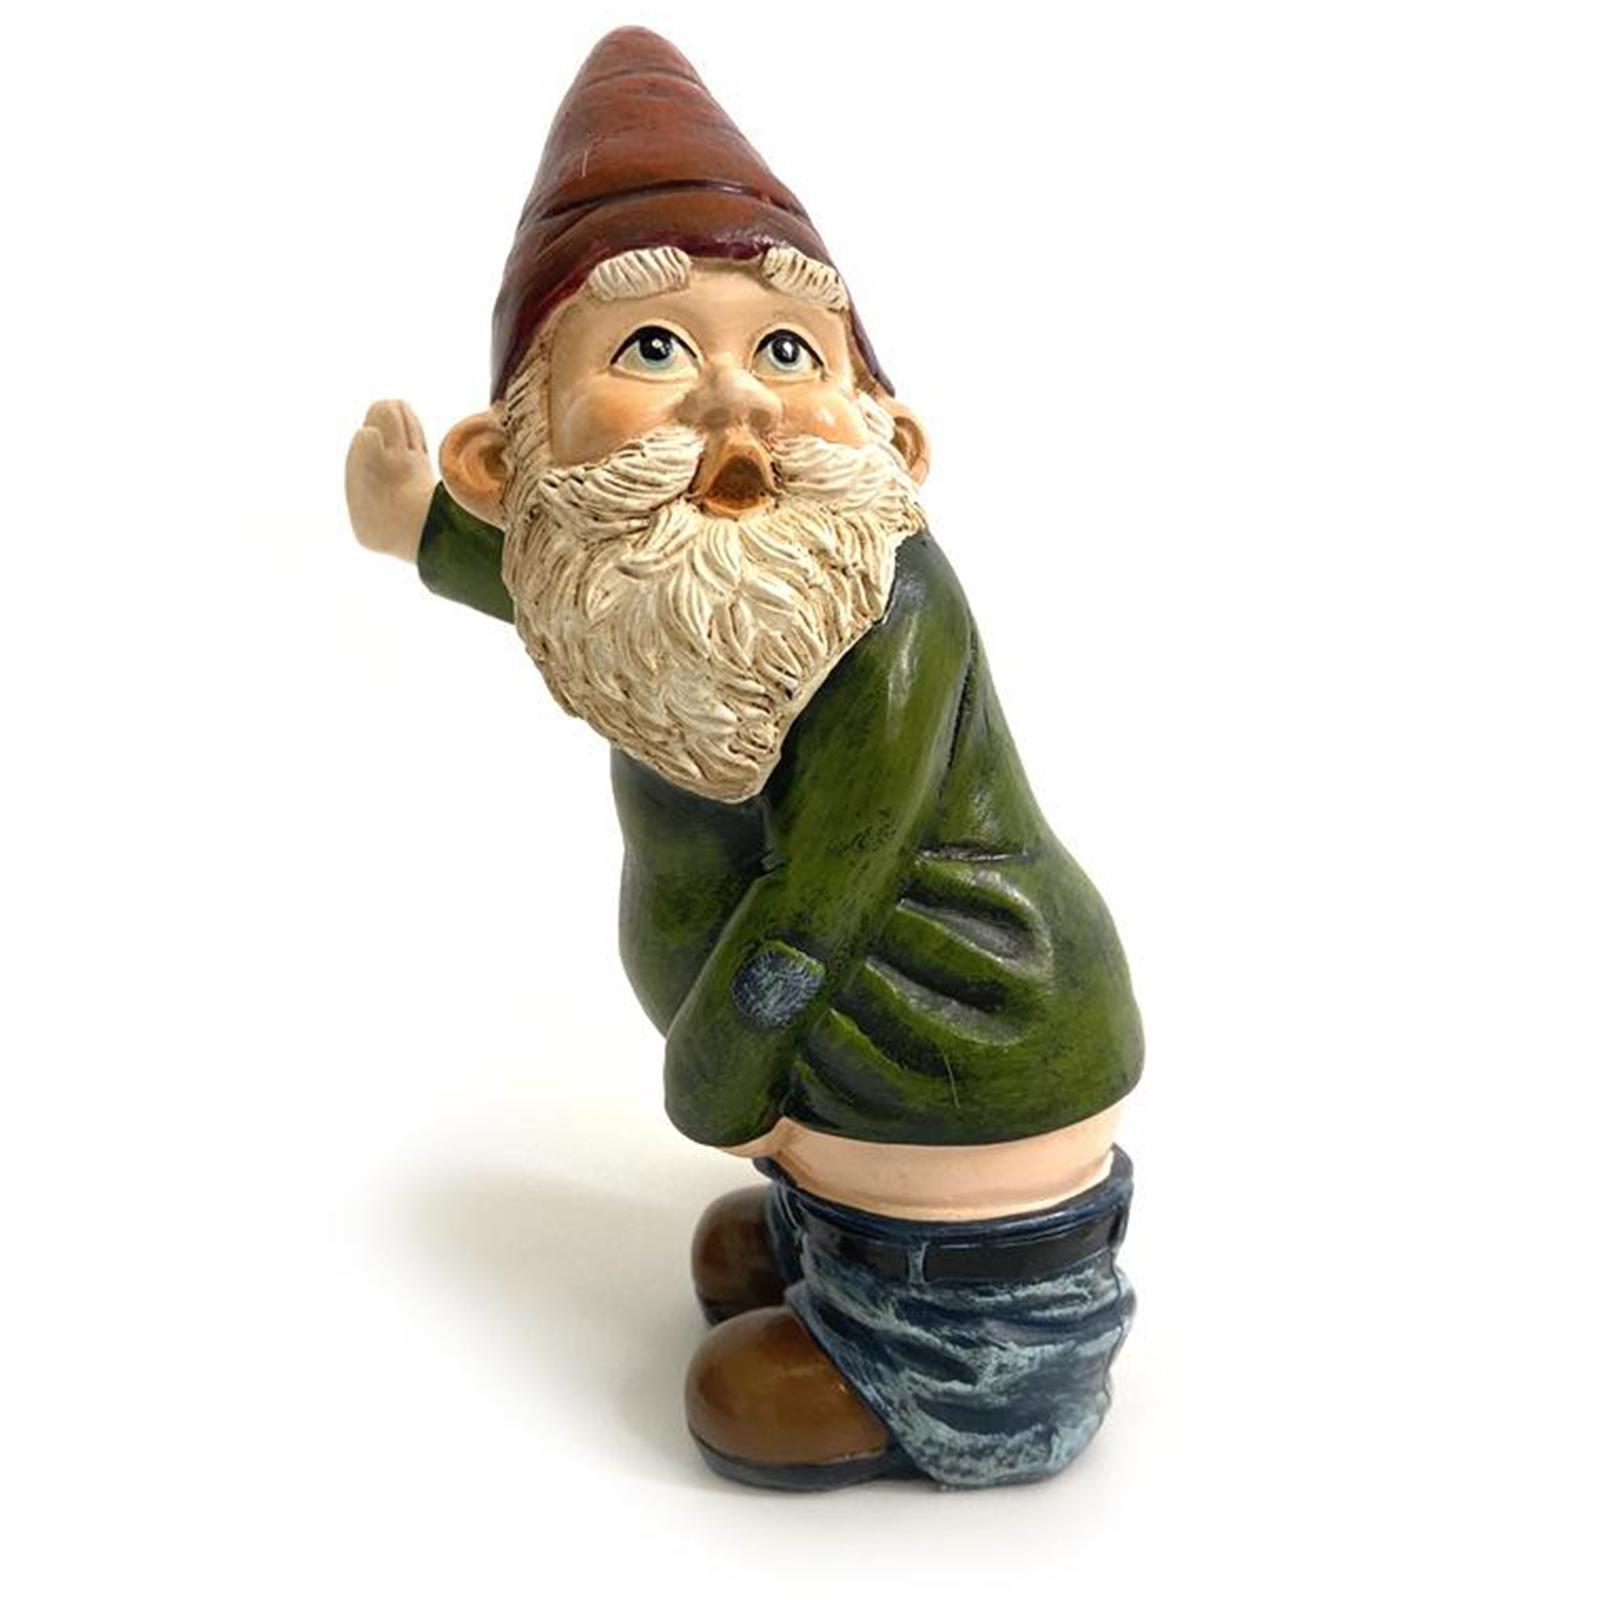 thumbnail 4 - Funny Resin Naughty Garden Gnome Statue Ornaments Villa Home Figurines Decor